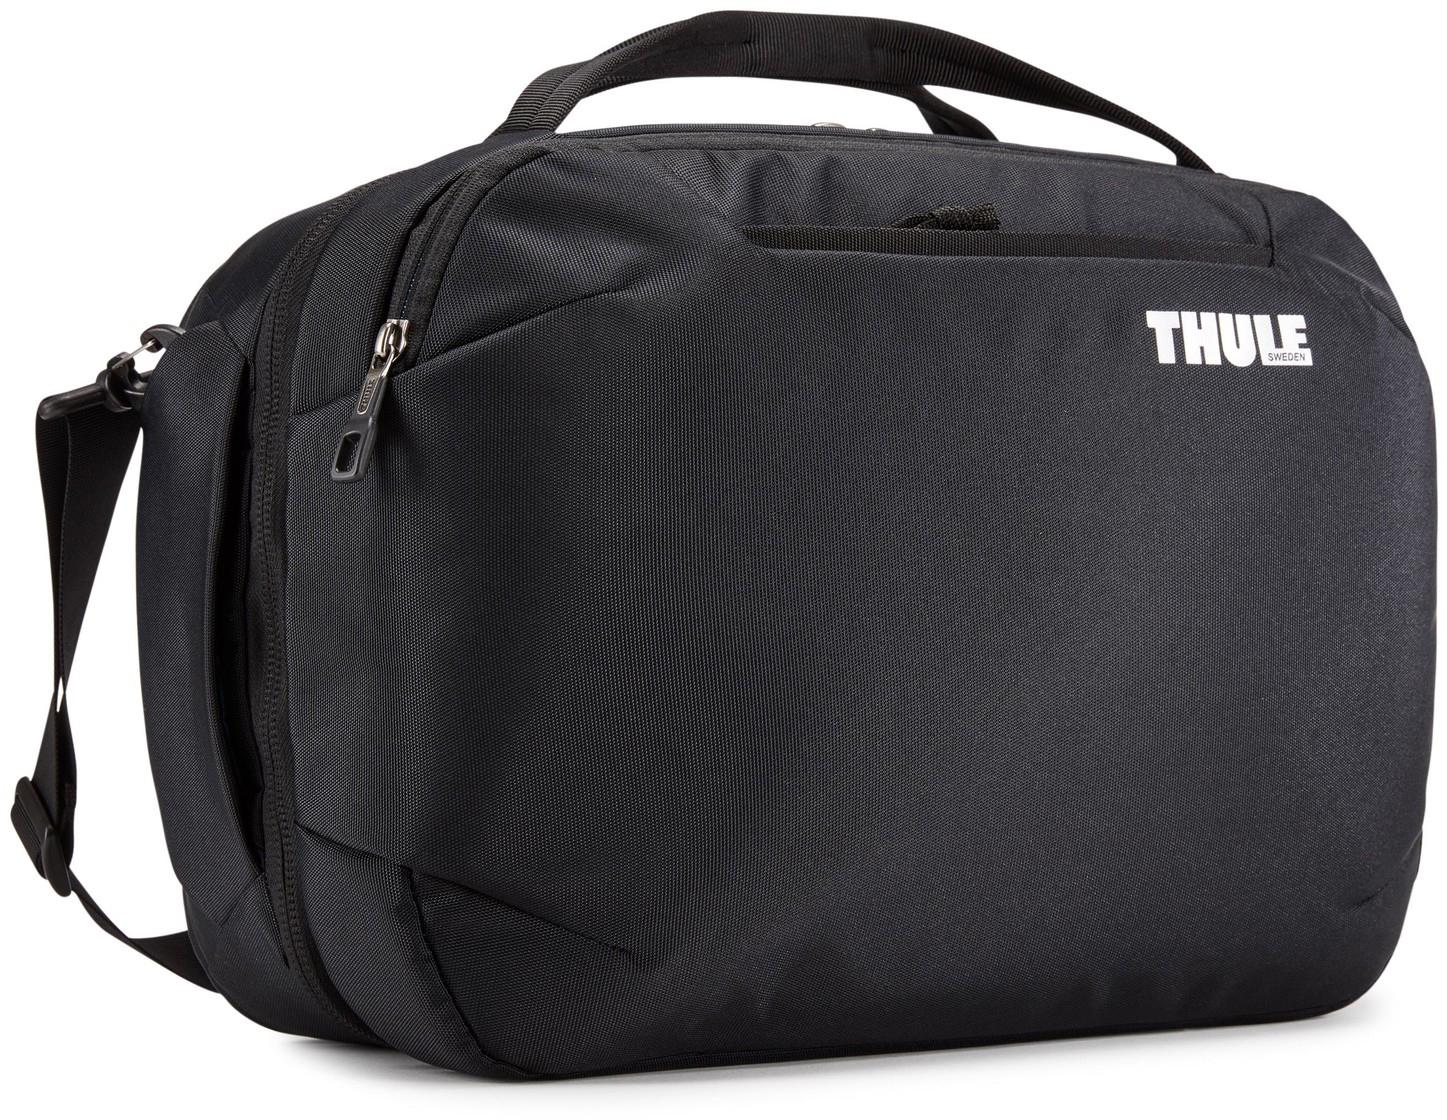 Городские сумки Thule Дорожная сумка Thule Subterra Boarding Bag 23l 685283_sized_1800x1200_rev_1.jpg